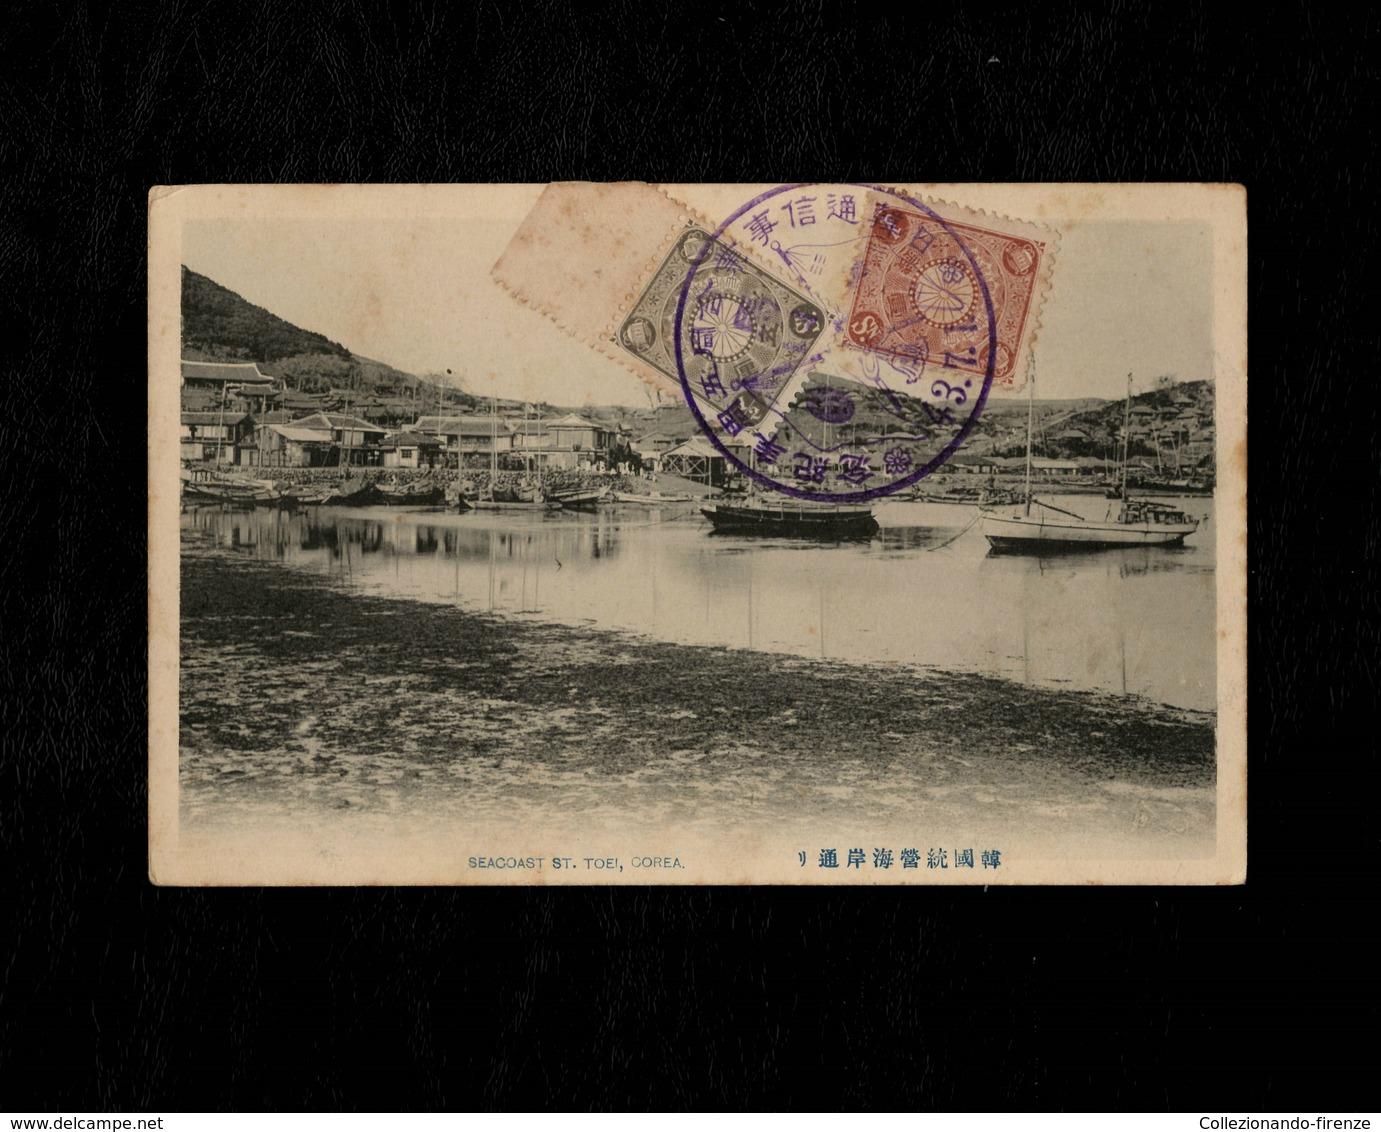 Cartolina Corea Seacoast St. Toei Corea Del Sud - With Stamp Not Sent - Corea Del Sud